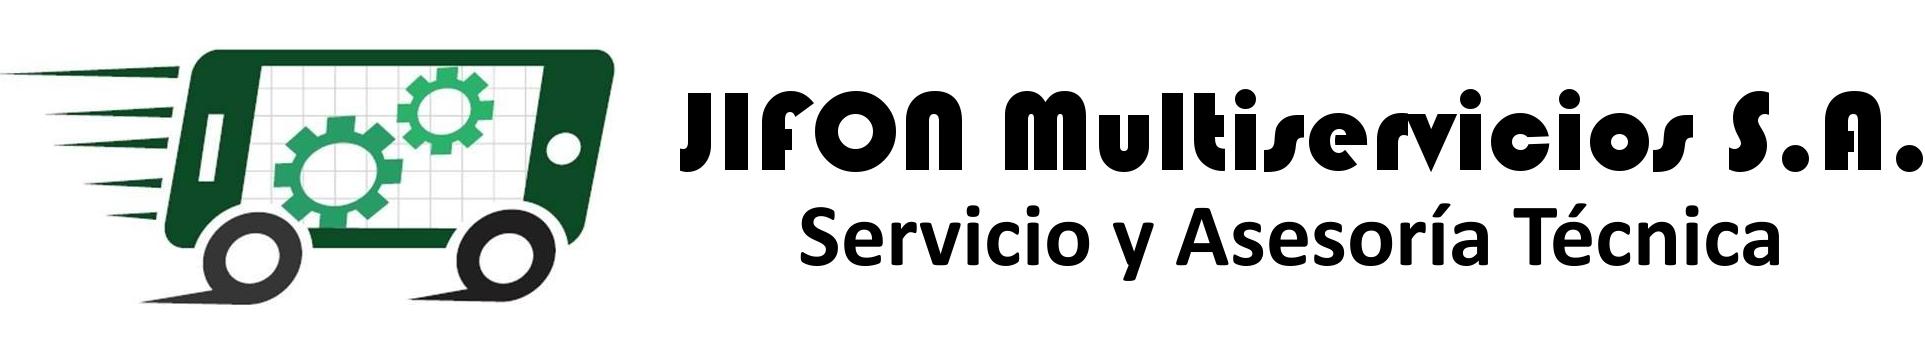 JIFON Mutiservicios